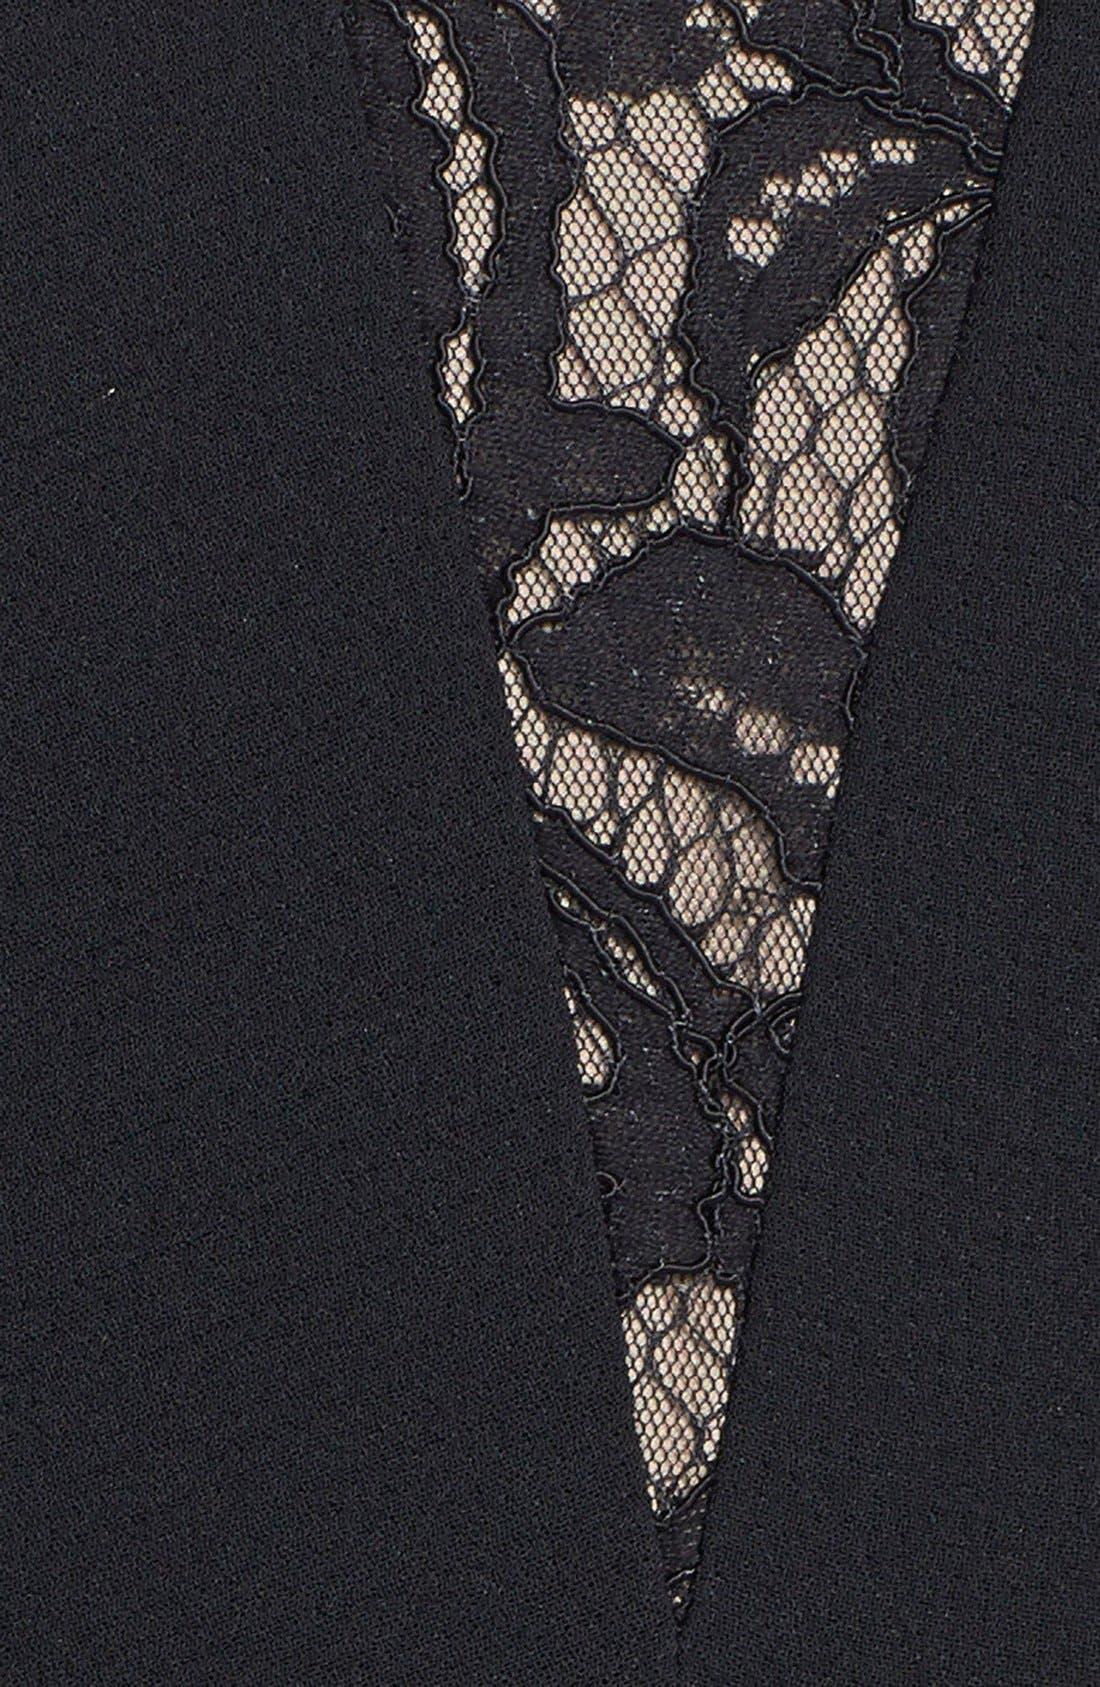 Alternate Image 3  - BCBGMAXAZRIA 'Silva' Lace Inset Crepe Peplum Gown